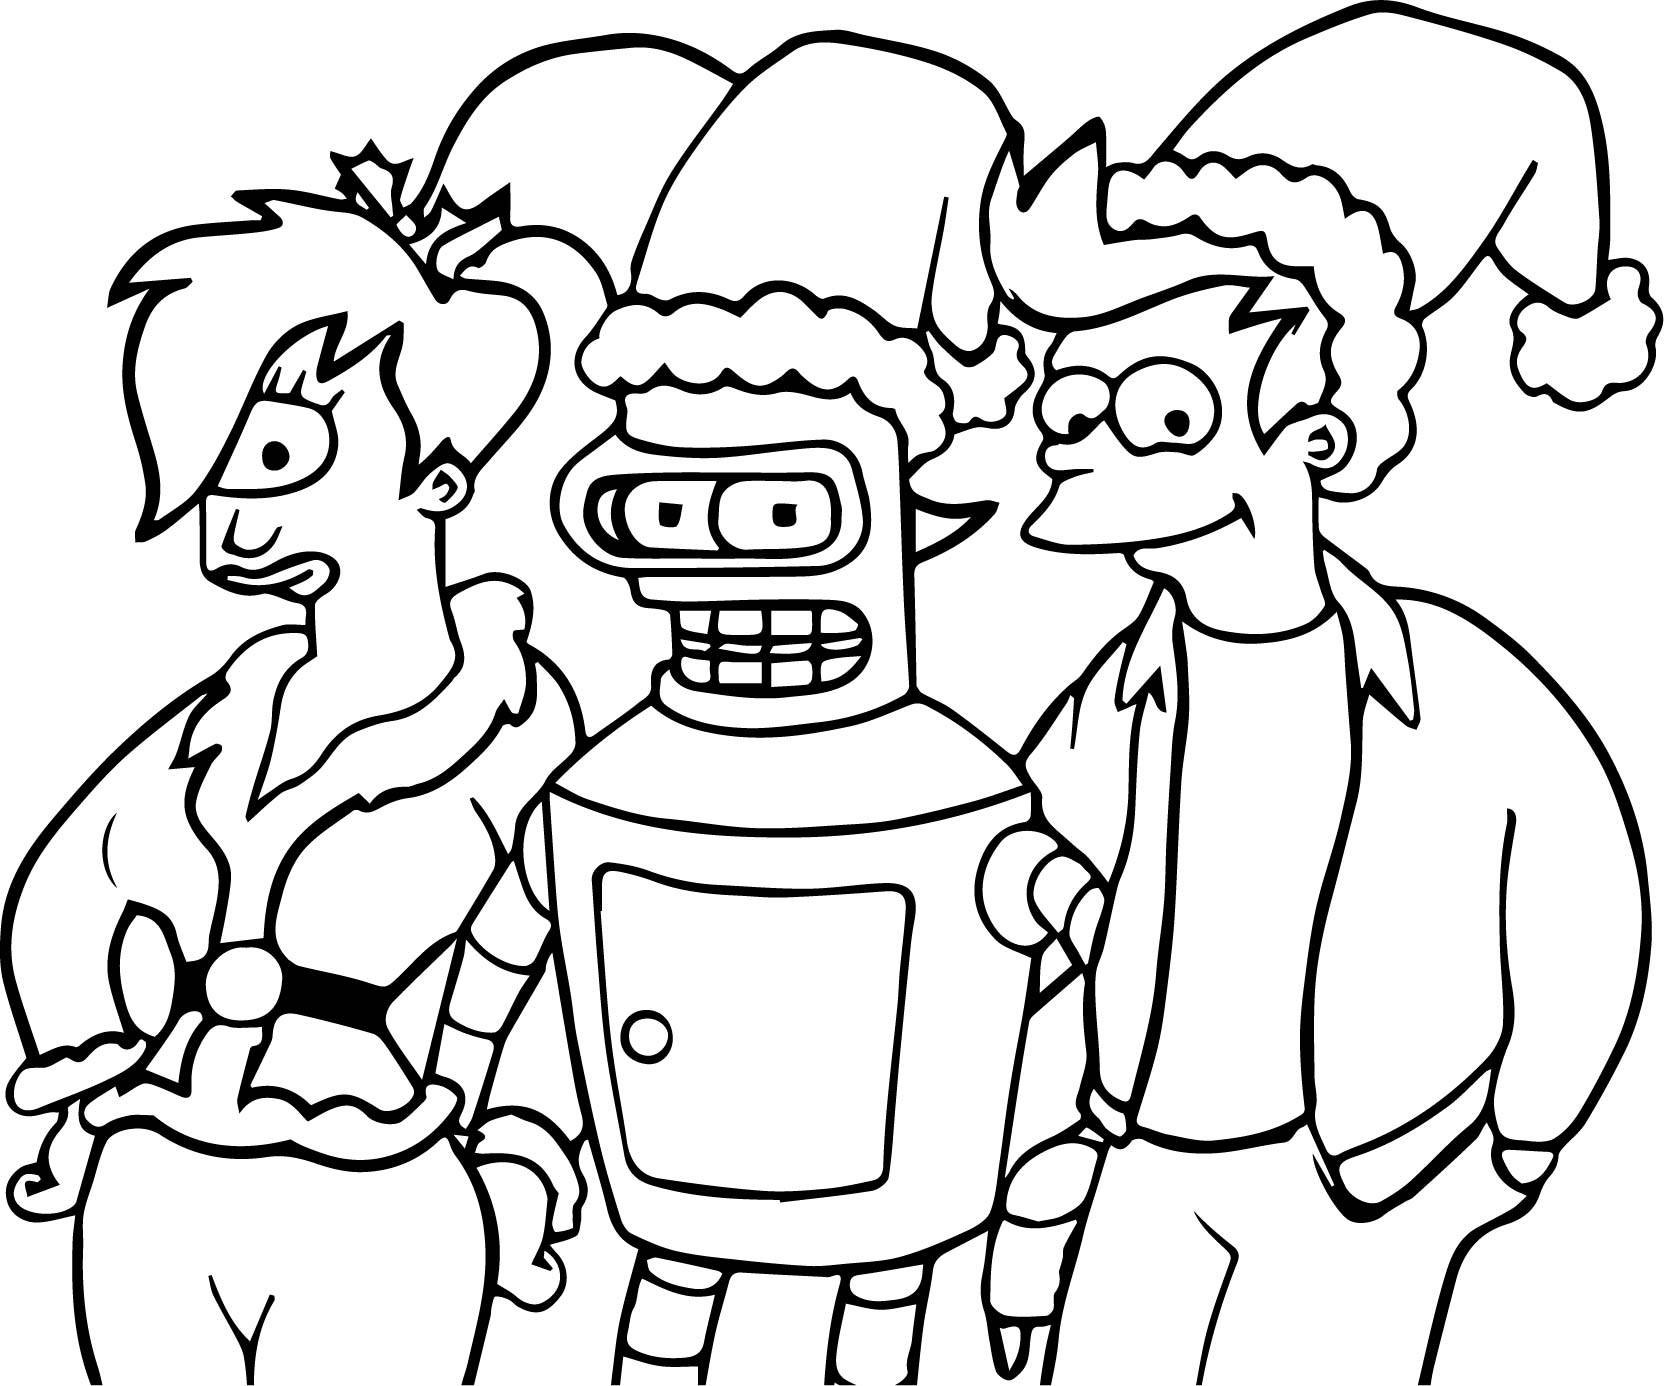 1664x1386 Anime Robot One Eye Girl And Boy Coloring Page Wecoloringpage